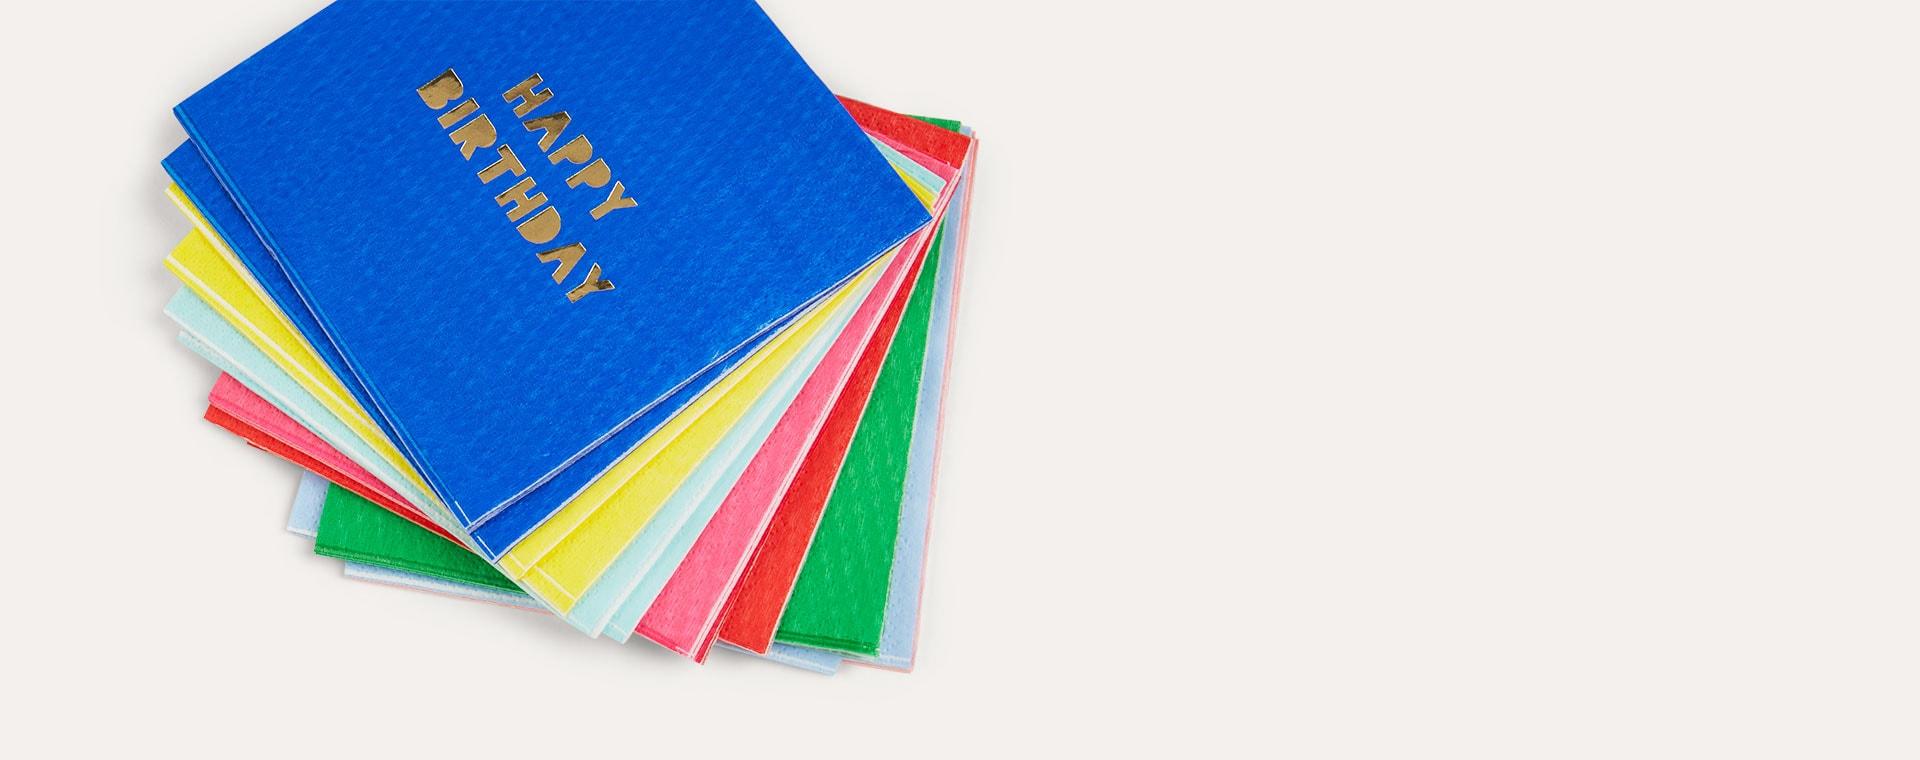 Multi Meri Meri Small Happy Birthday Paper Napkins - 16 Pack